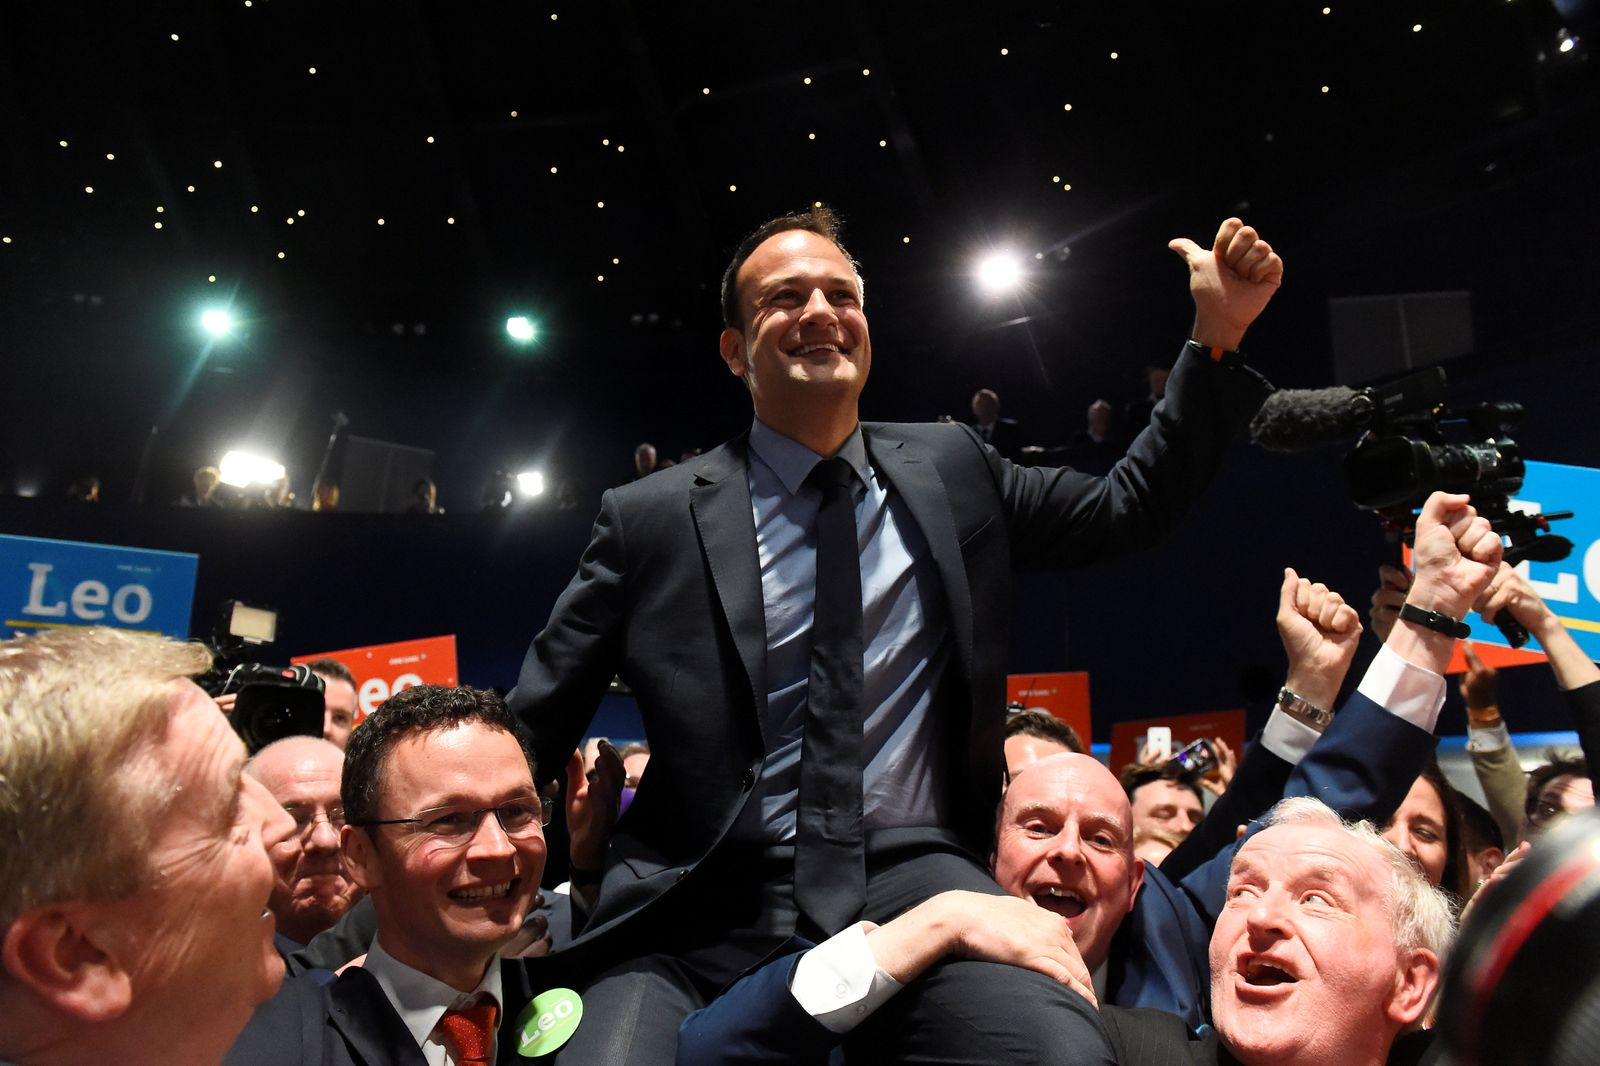 IRELAND-POLITICS/